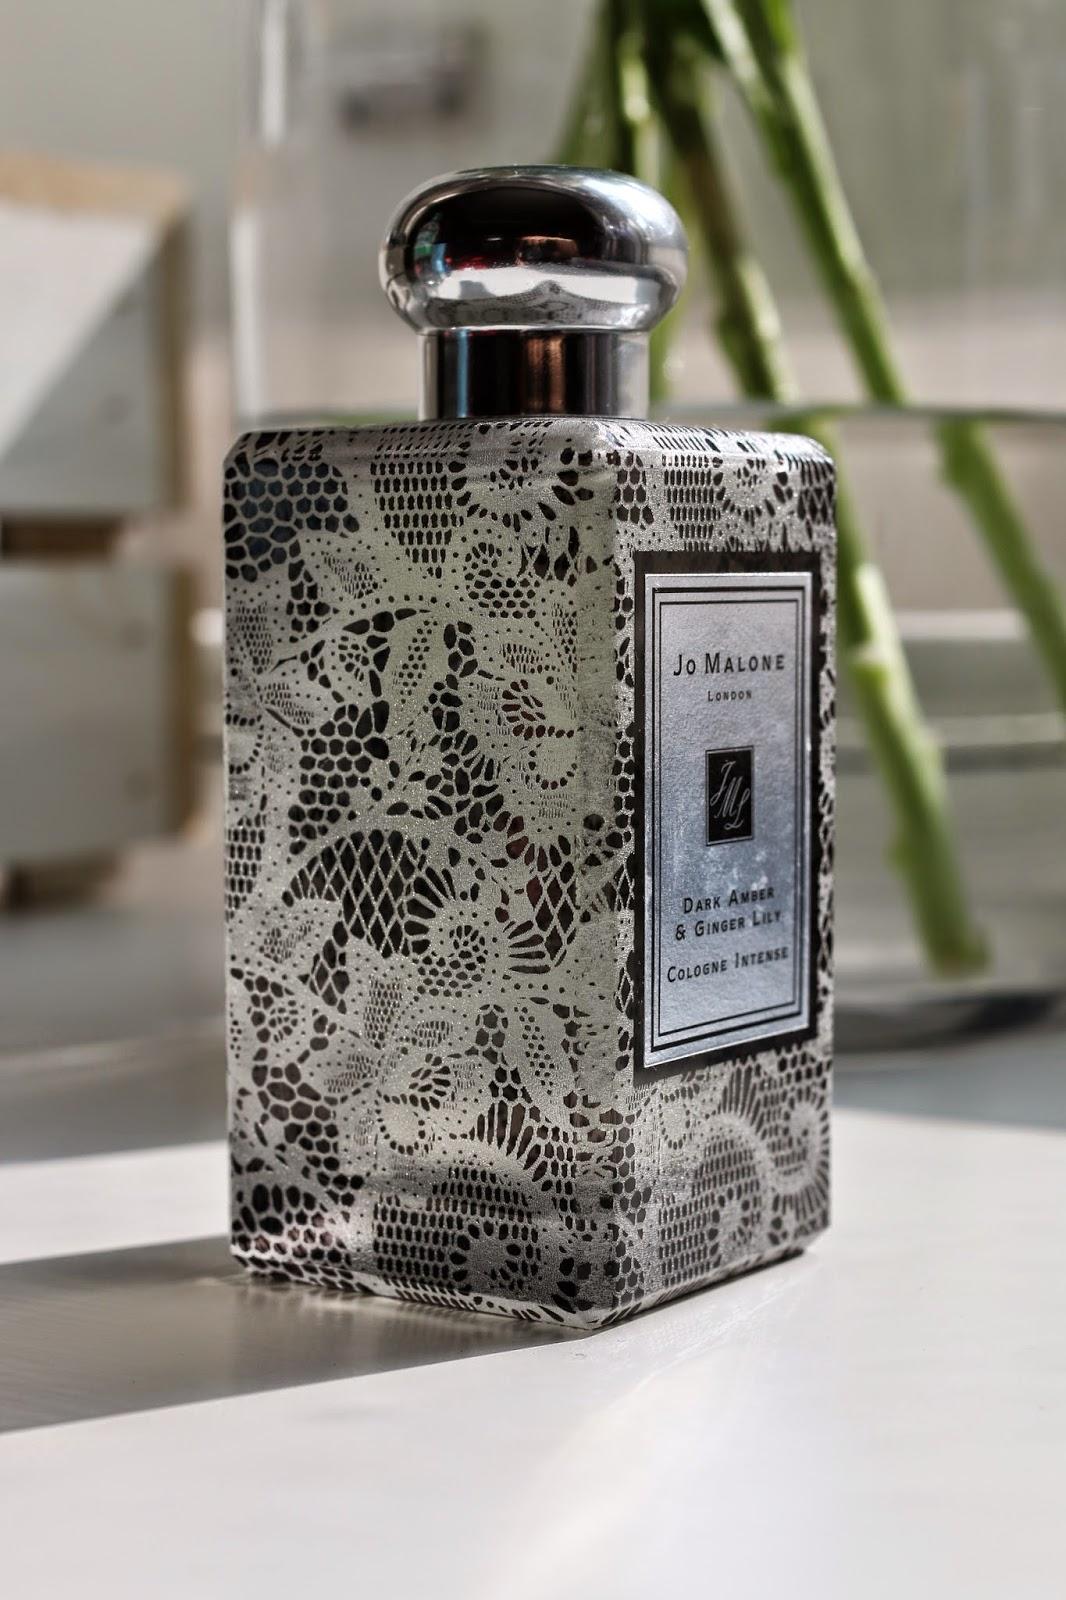 jo malone london lace bottle collection caroline hirons. Black Bedroom Furniture Sets. Home Design Ideas